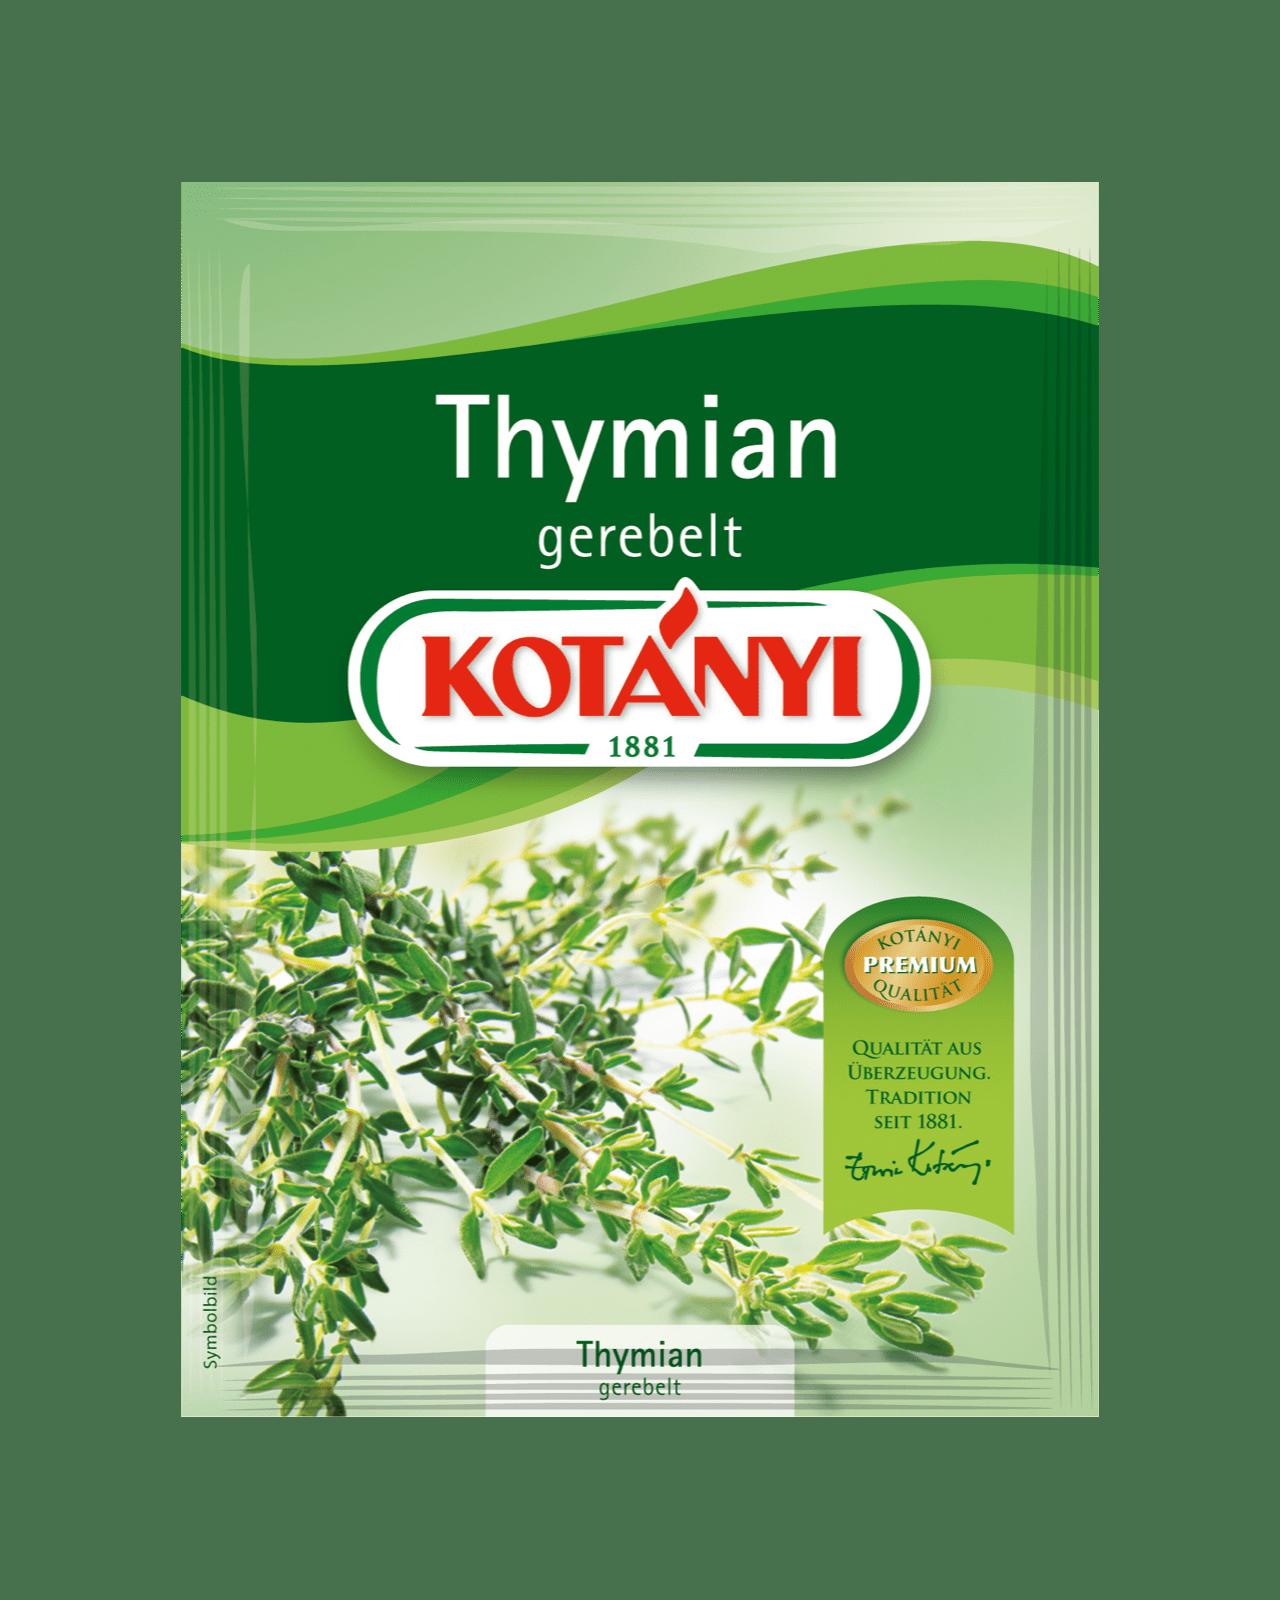 Kotányi Thymian gerebelt im Brief